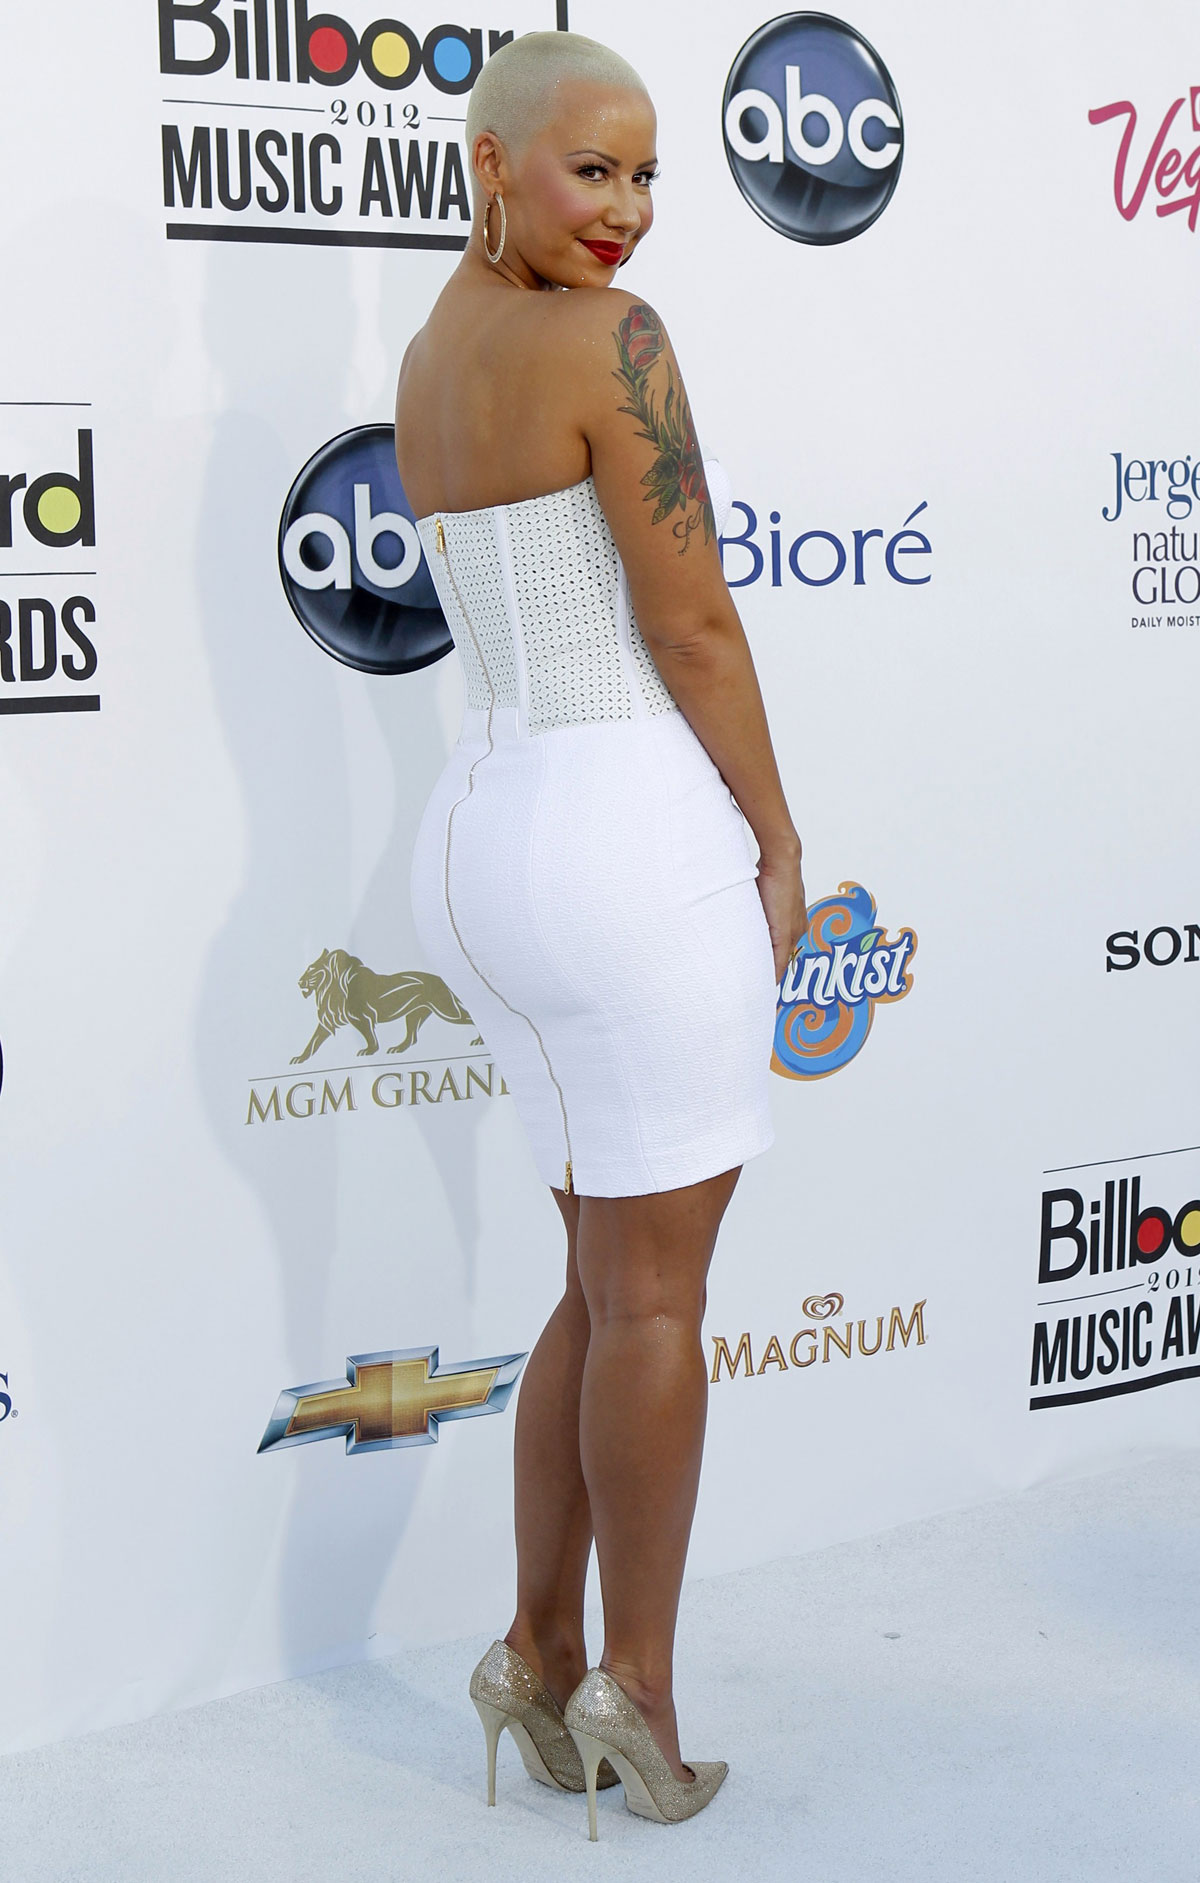 AMBER ROSE at Billboard Music Awards – HawtCelebs